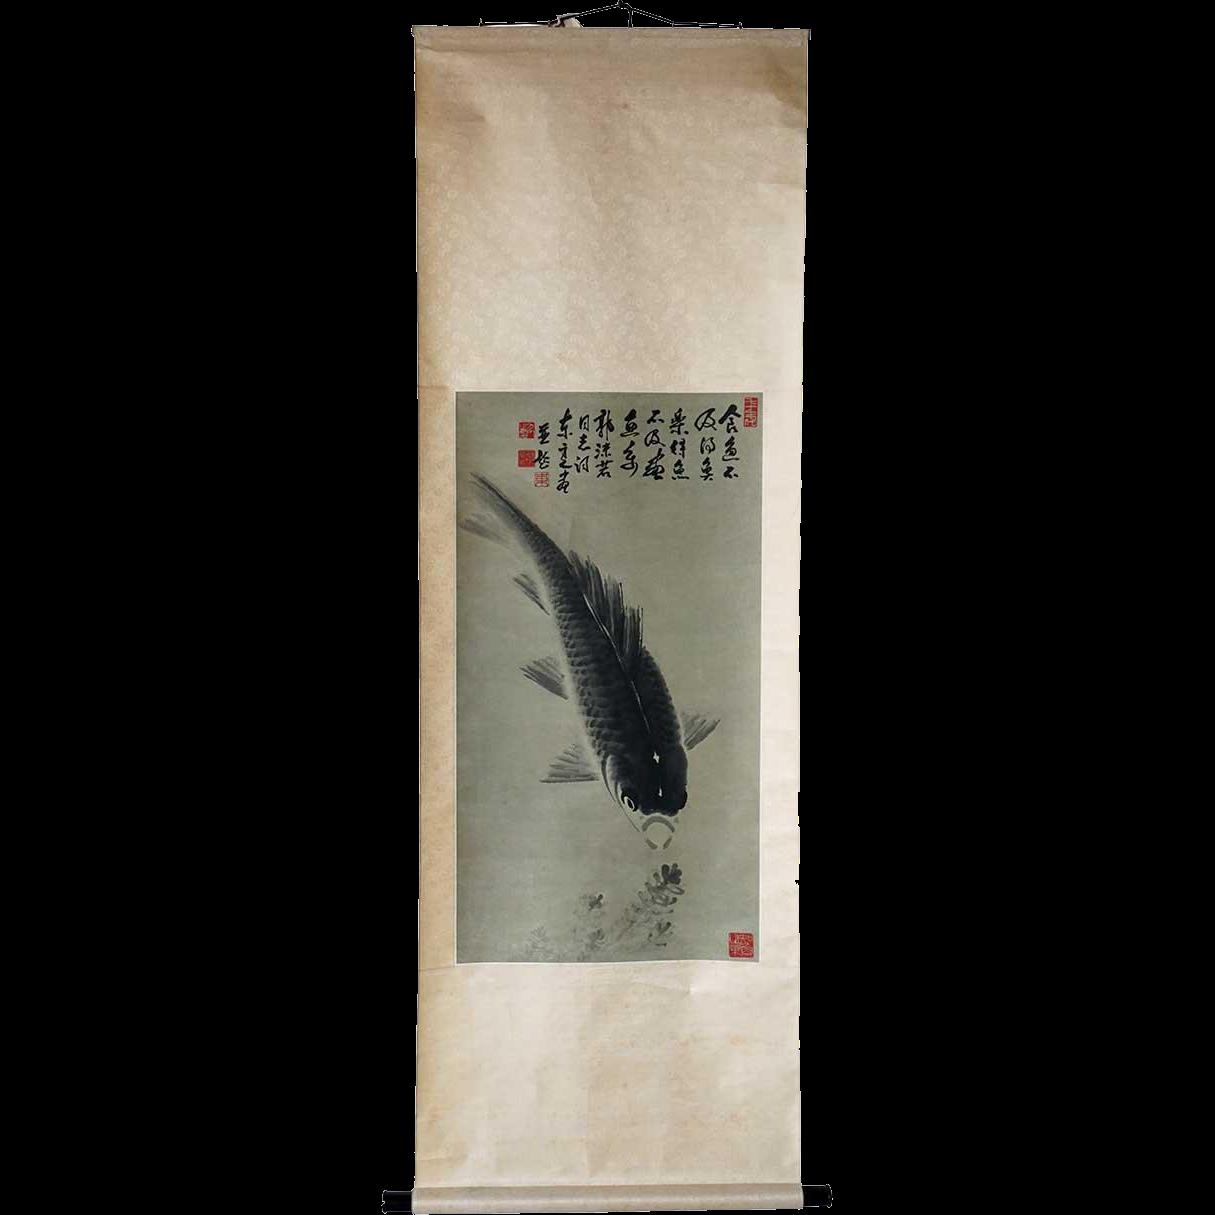 Japanese Ink on Paper Vertical Hanging Scroll (Kakejiku) Painting of Koi